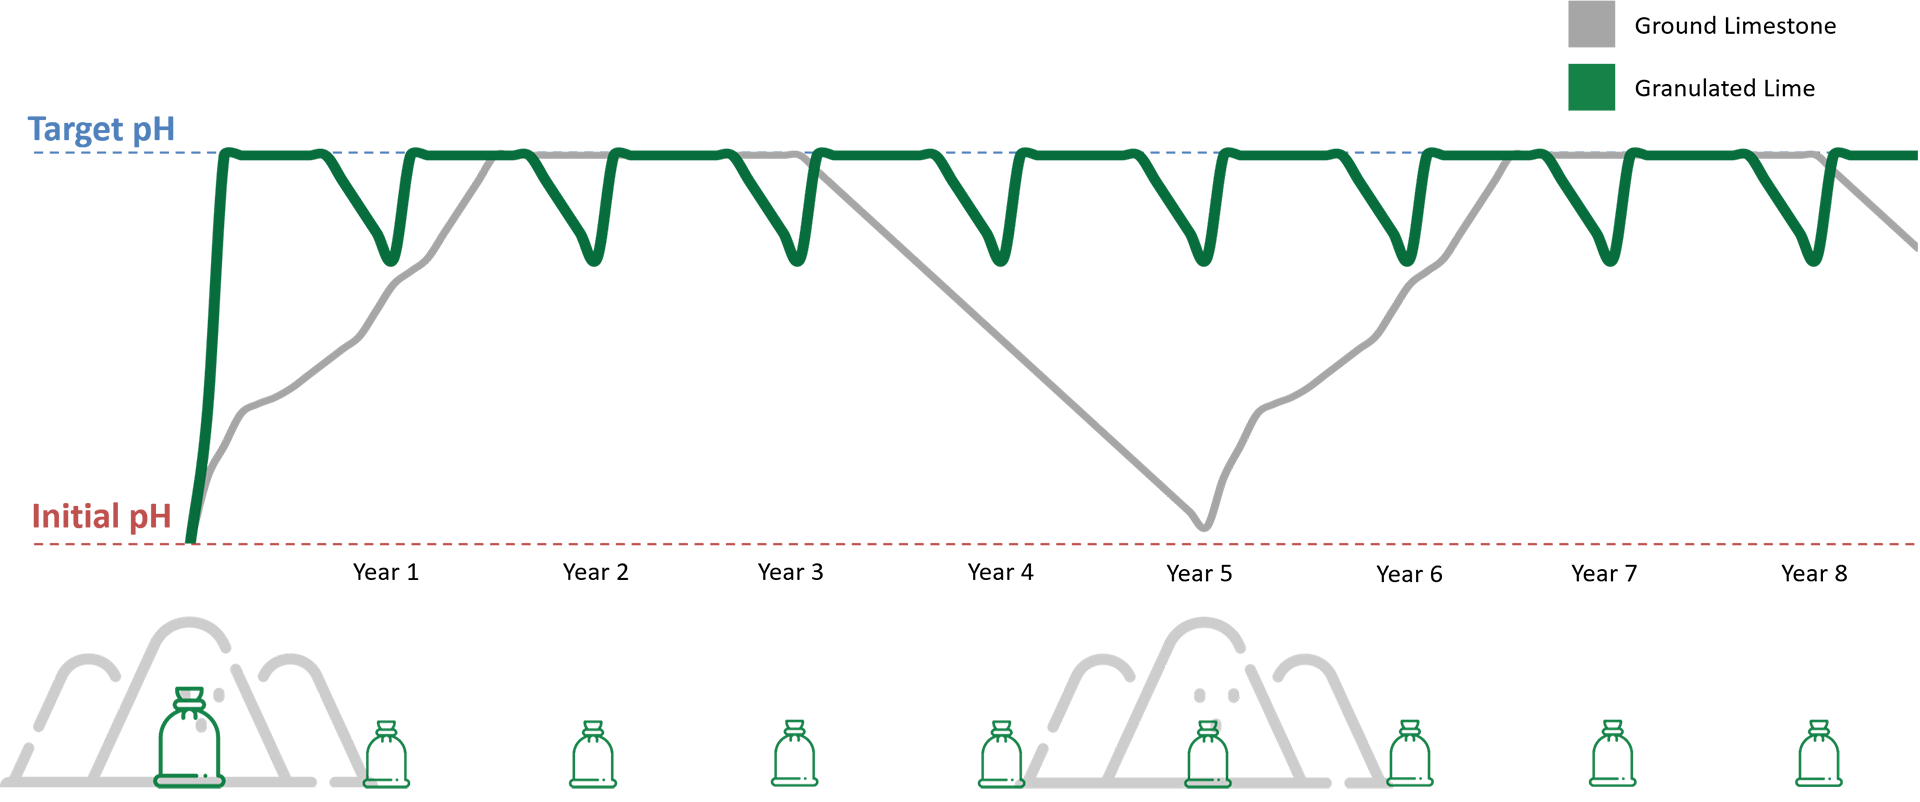 G-Lime diagram